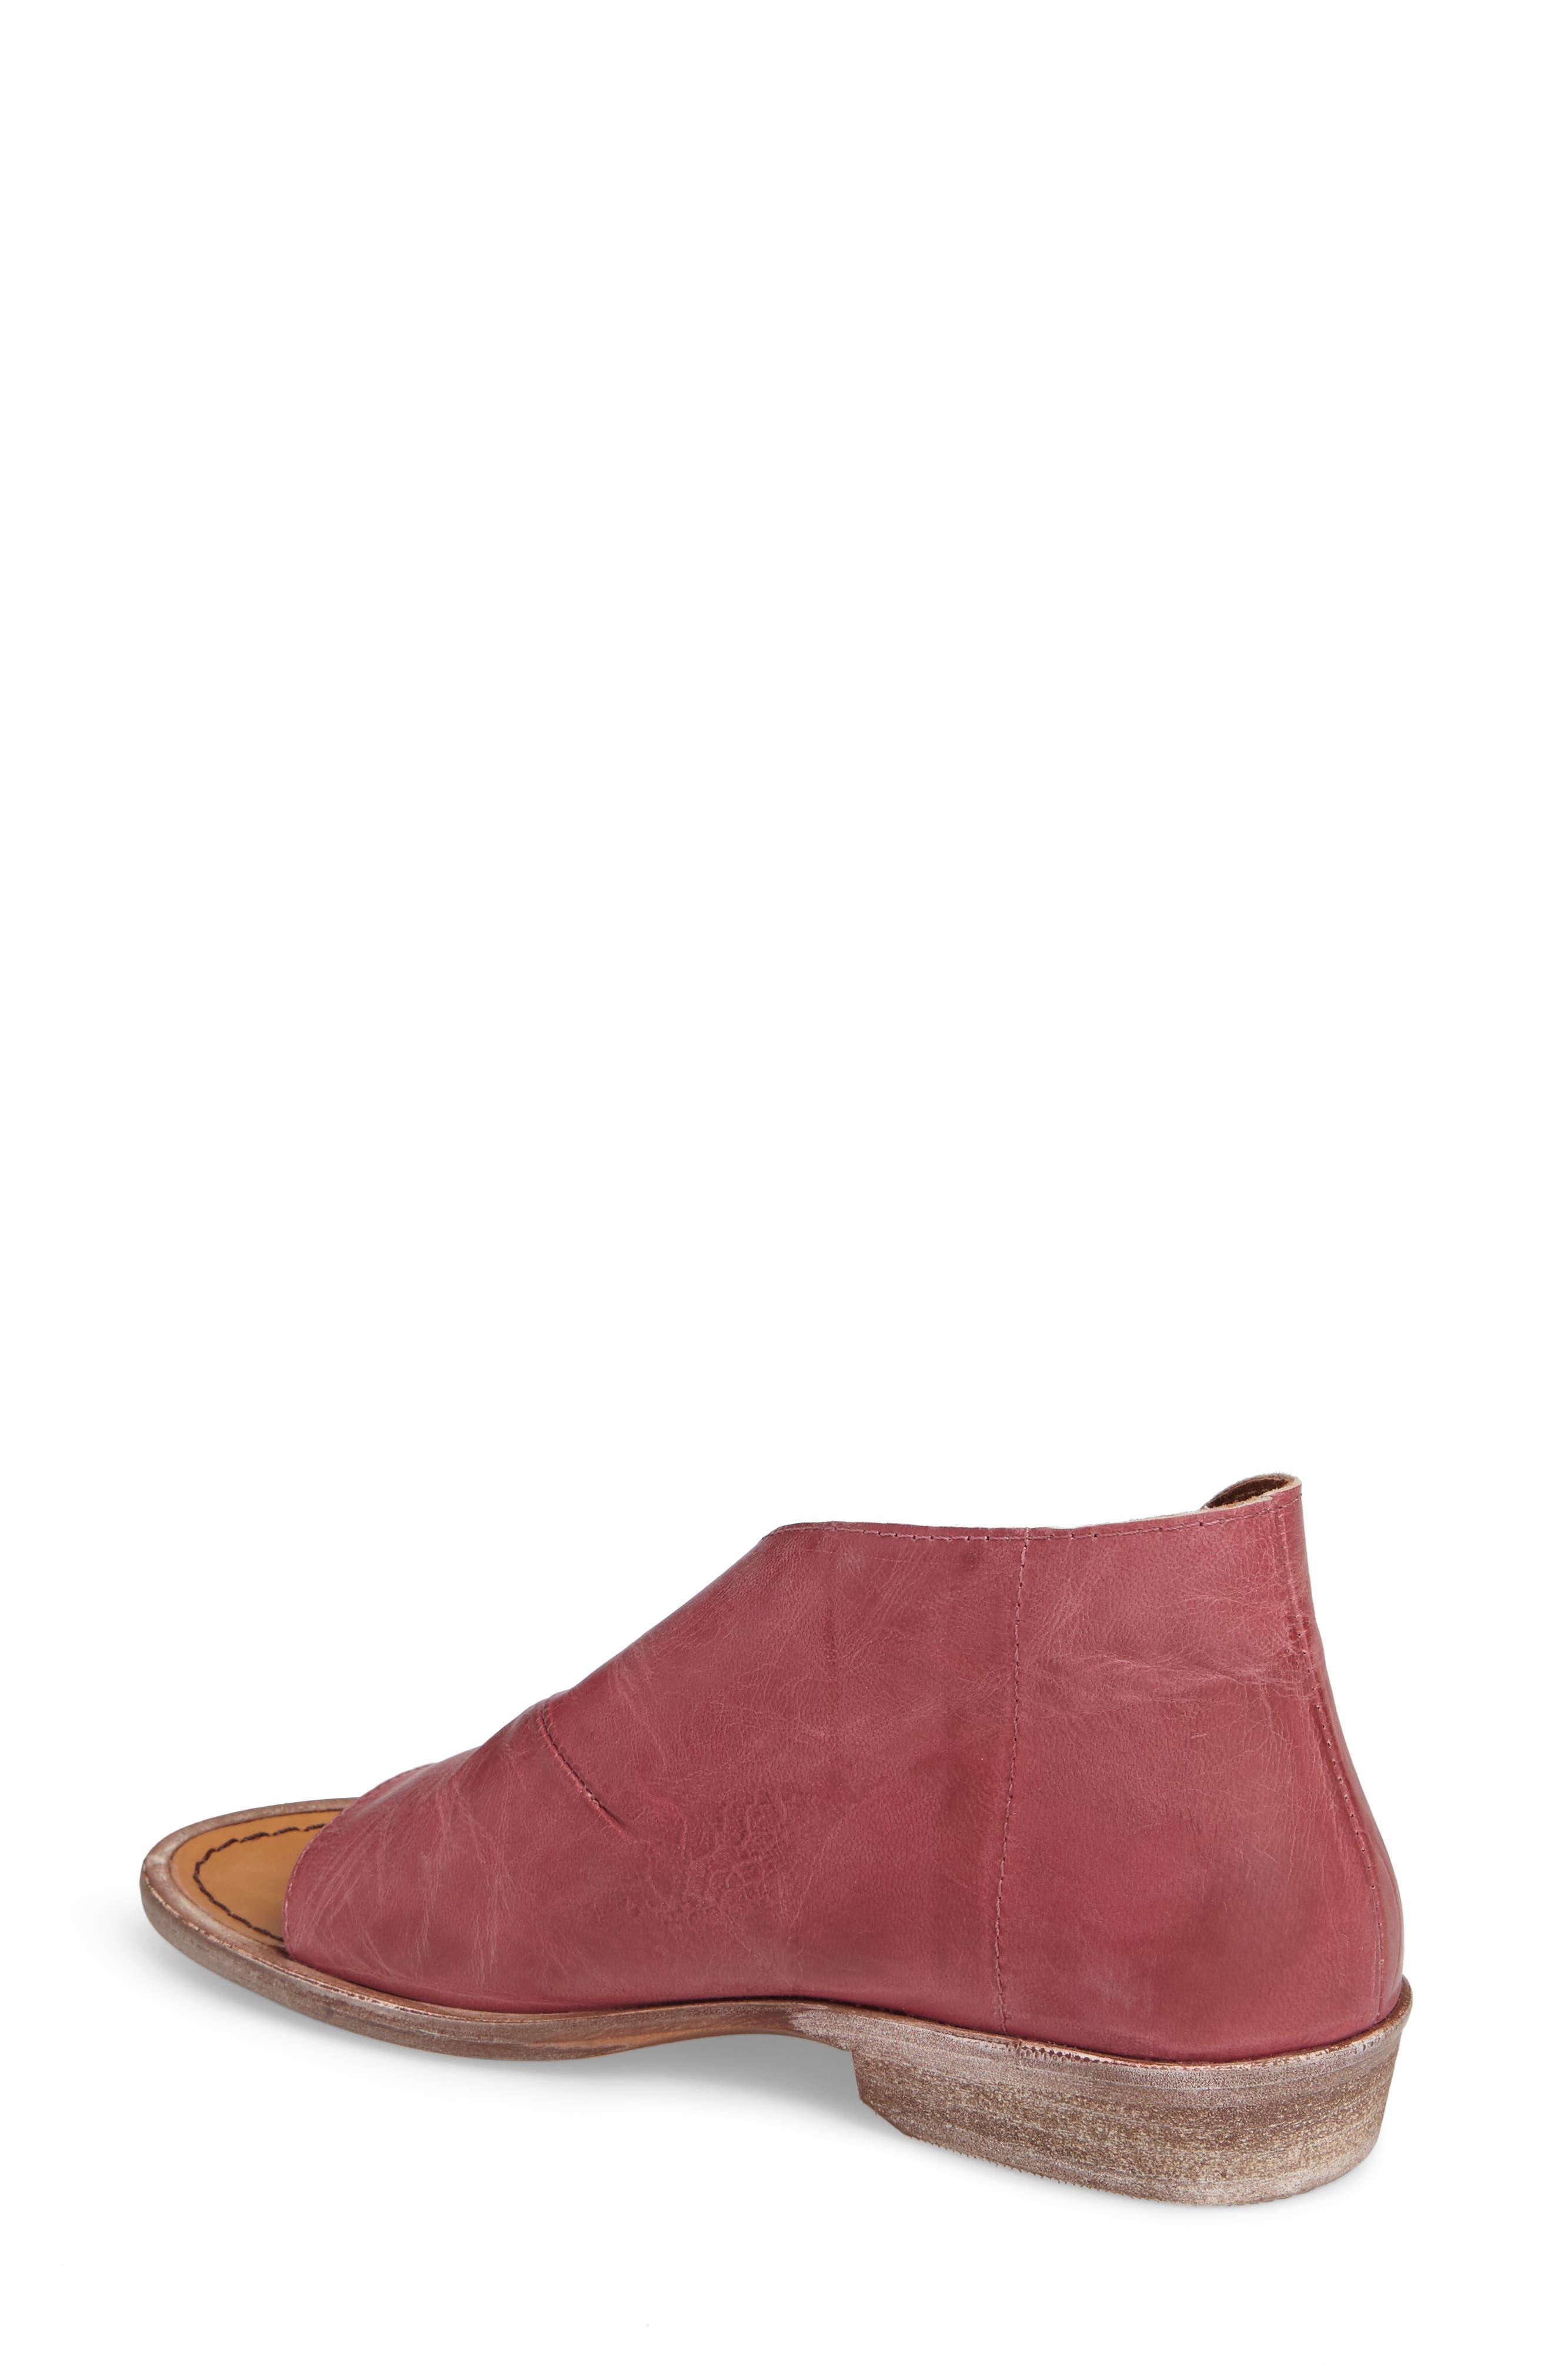 'Mont Blanc' Asymmetrical Sandal,                             Alternate thumbnail 28, color,